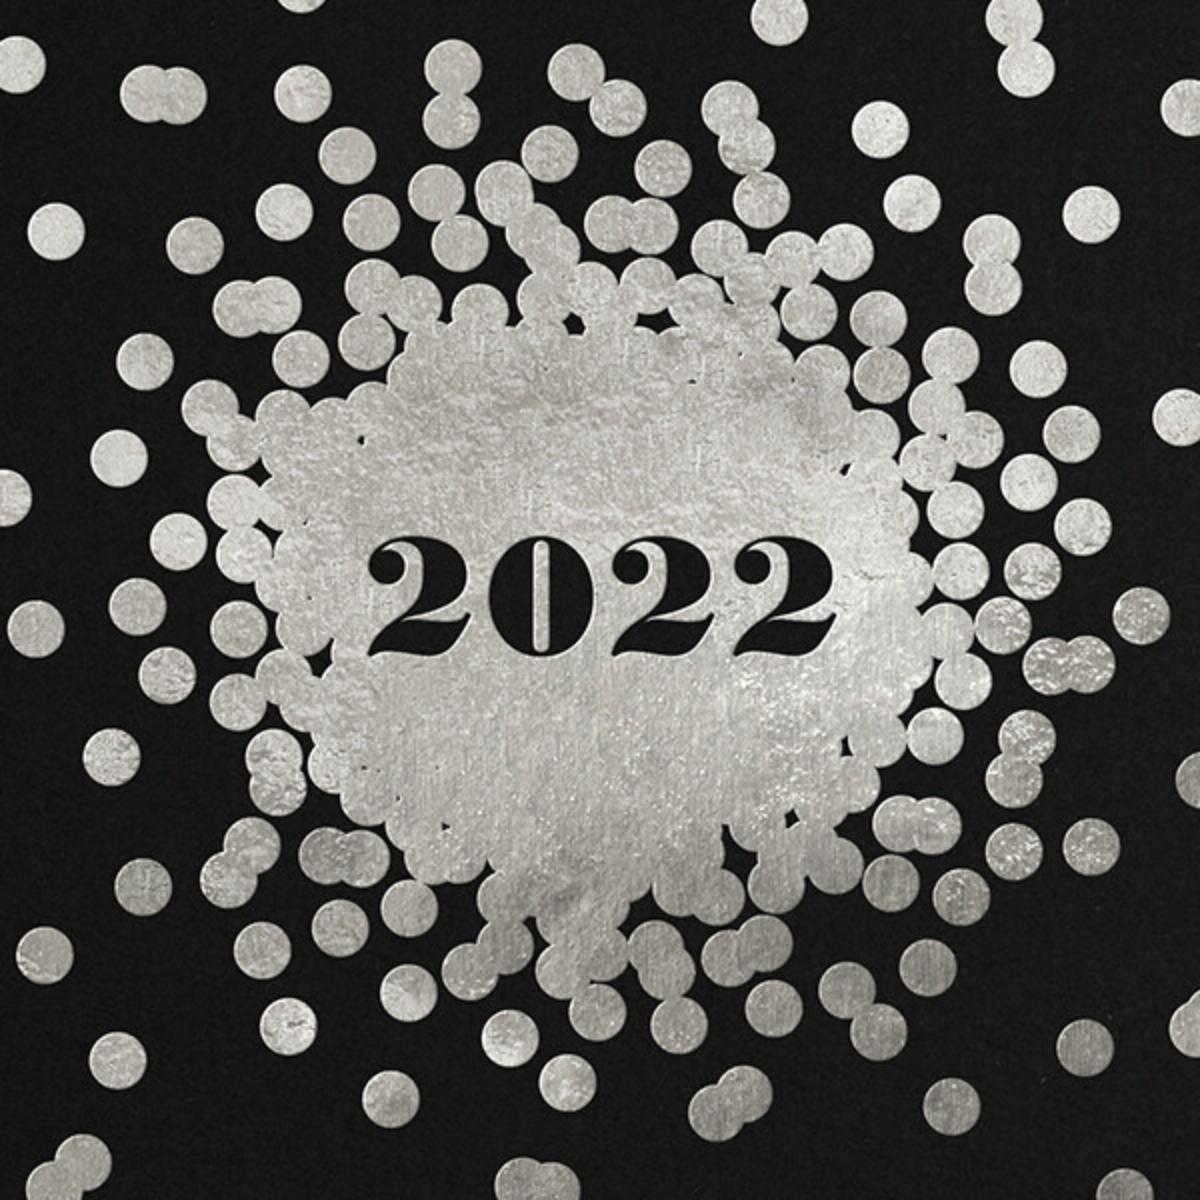 Confetti New Year (Greeting) - Silver/Black - kate spade new york